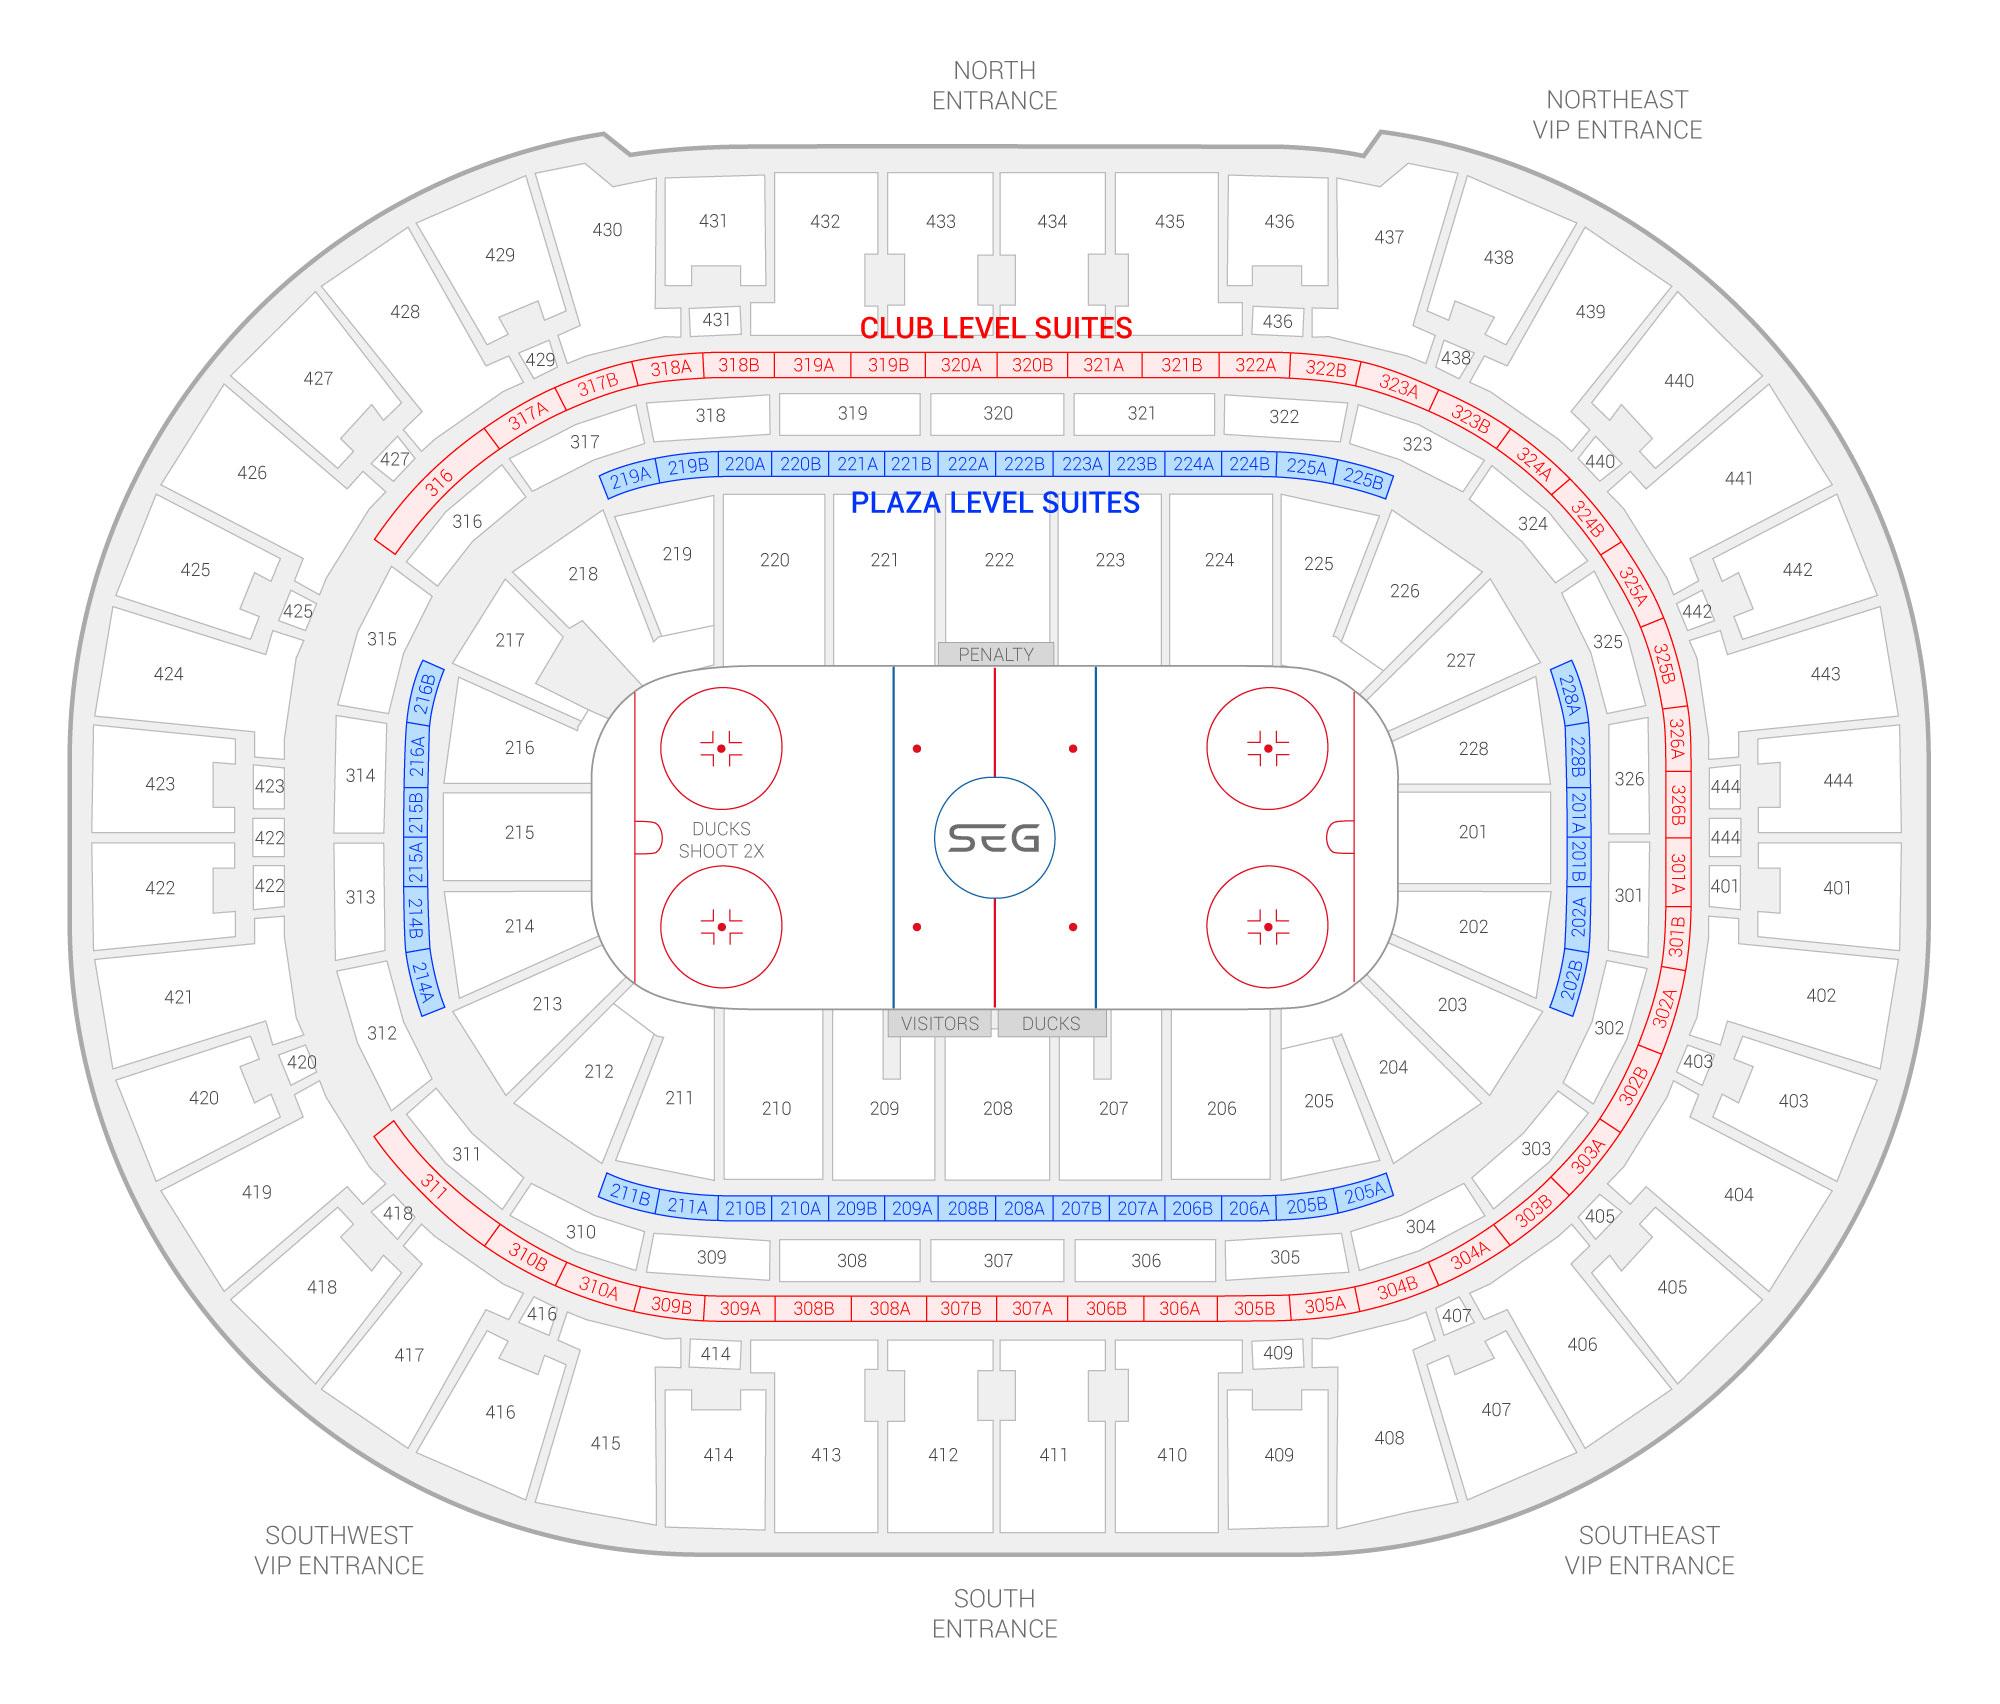 Honda Center / Anaheim Ducks Suite Map and Seating Chart